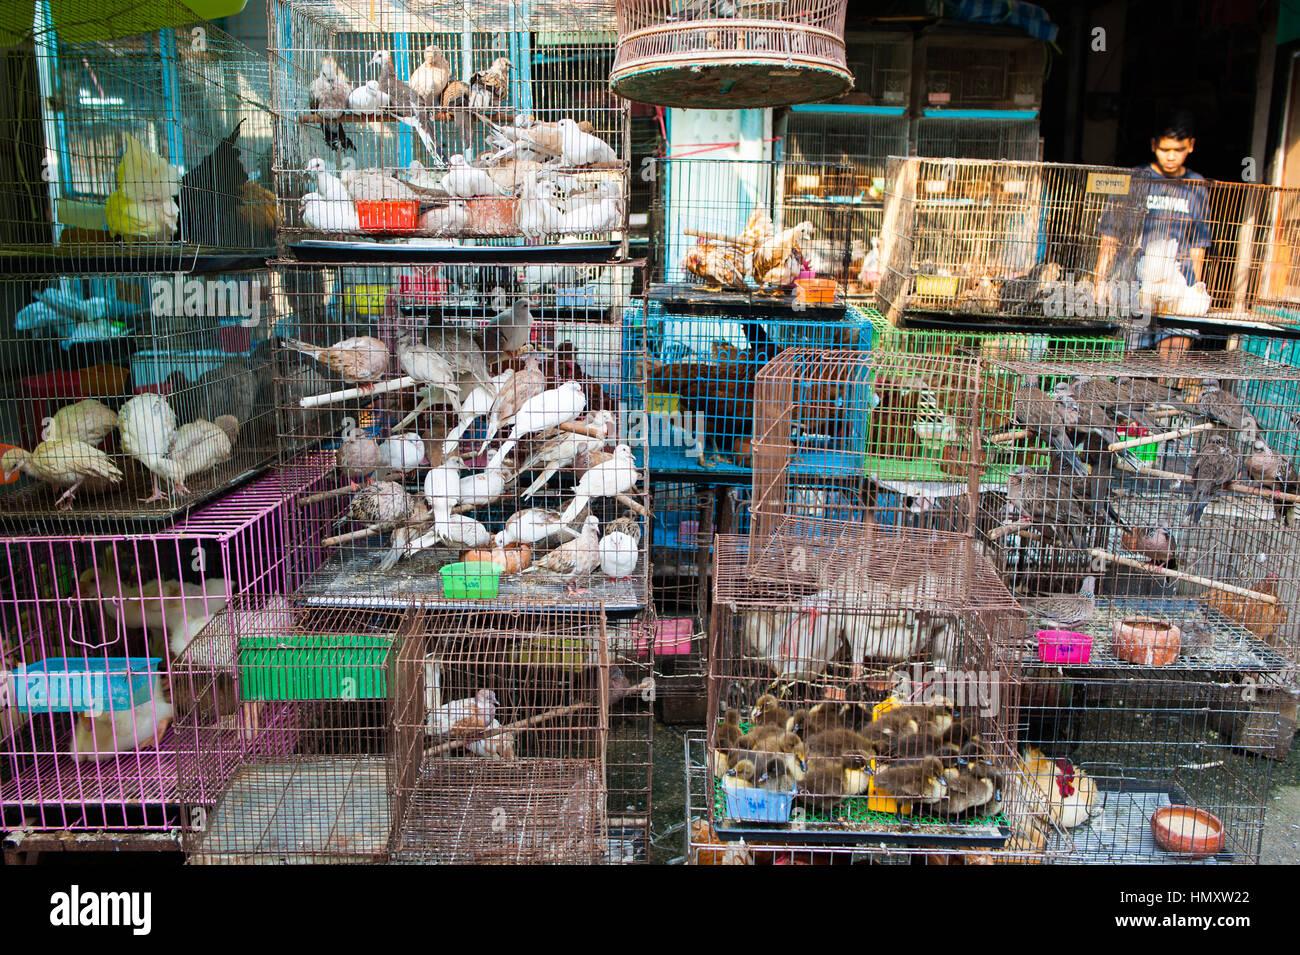 Animals In Chatuchak Market Bangkok Stock Photo Royalty